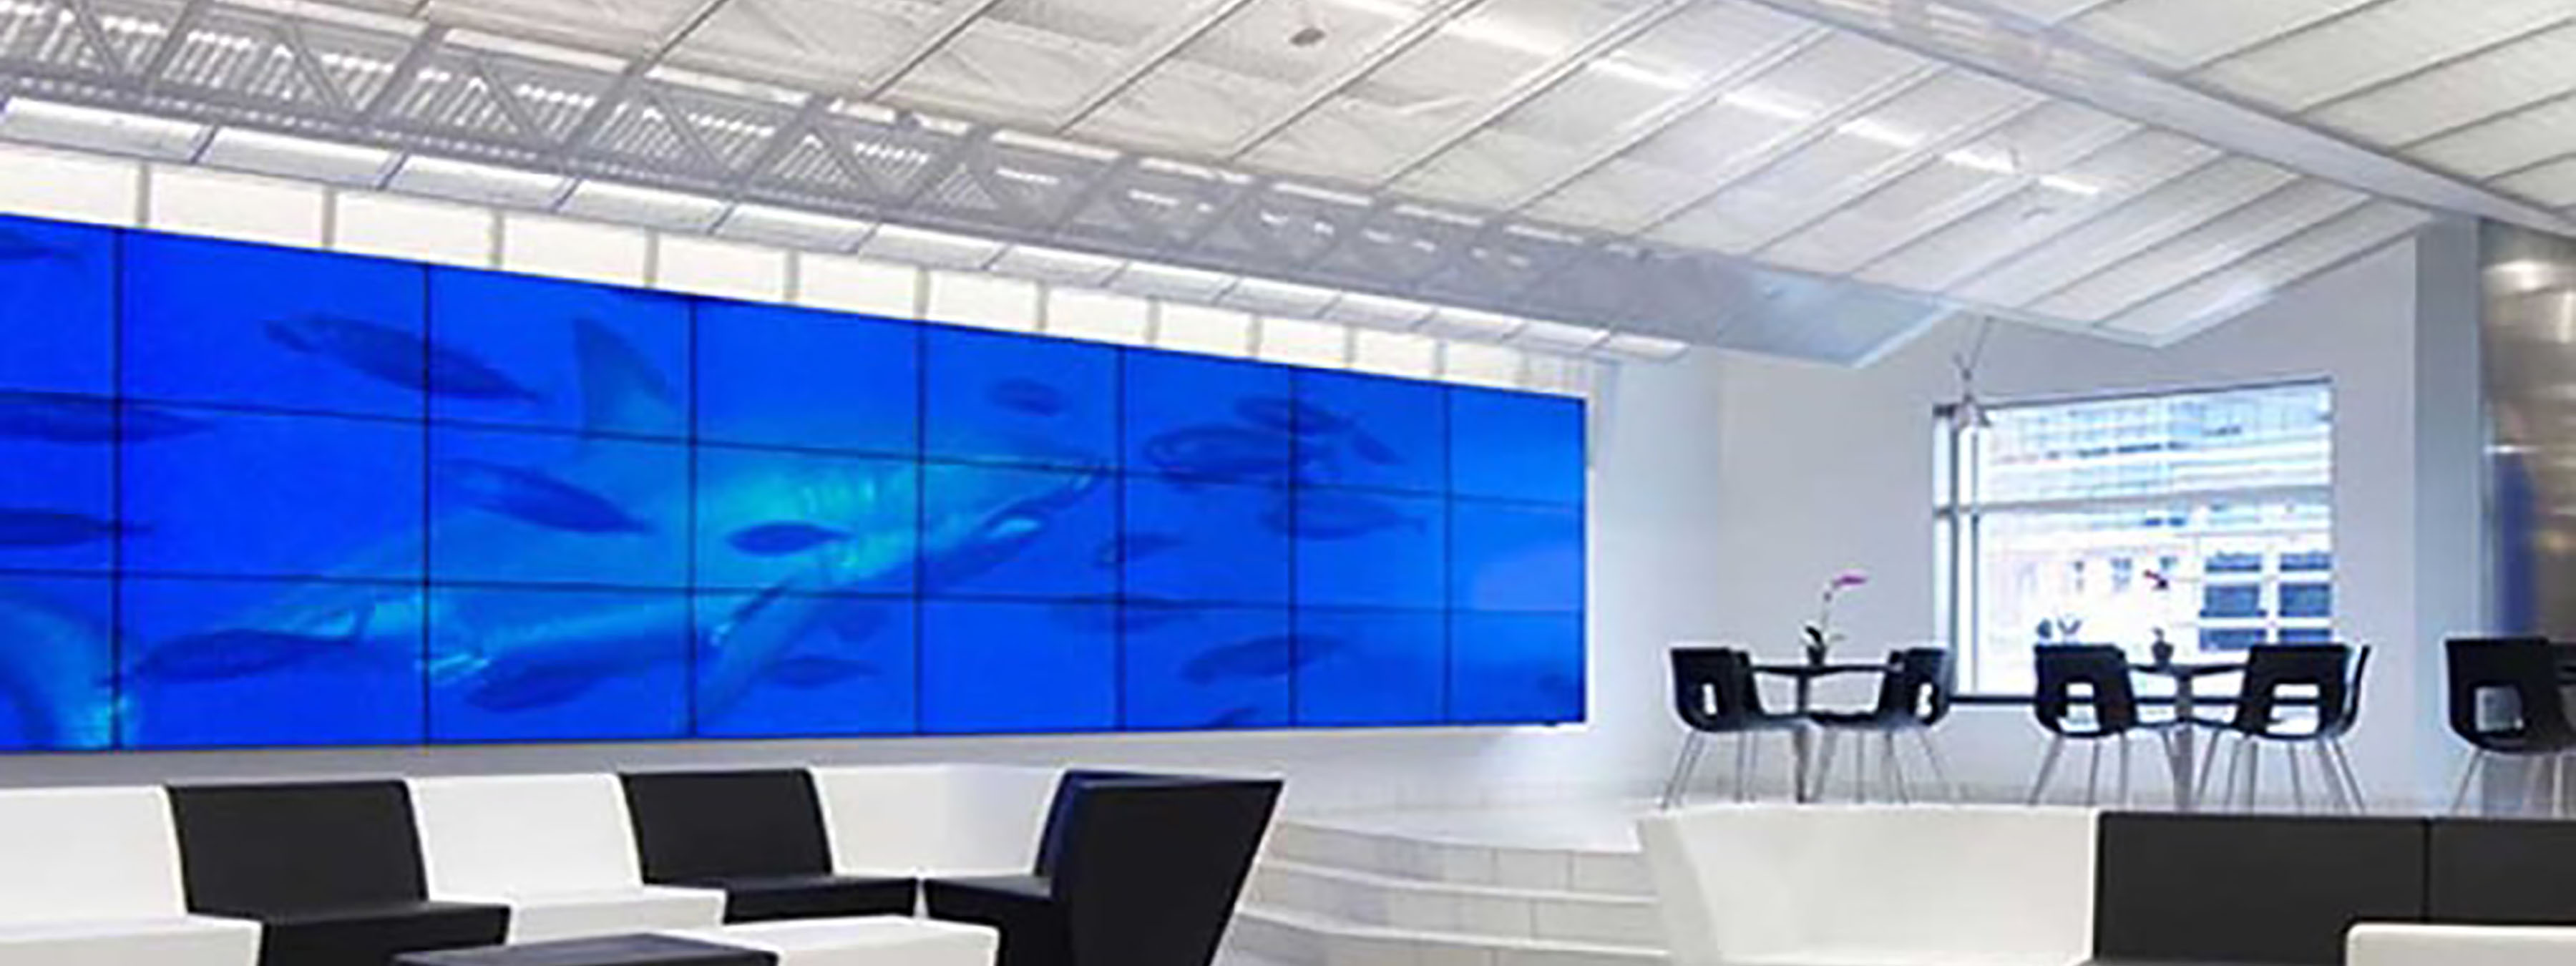 Inovation-lobbylounge-3600 x 1350